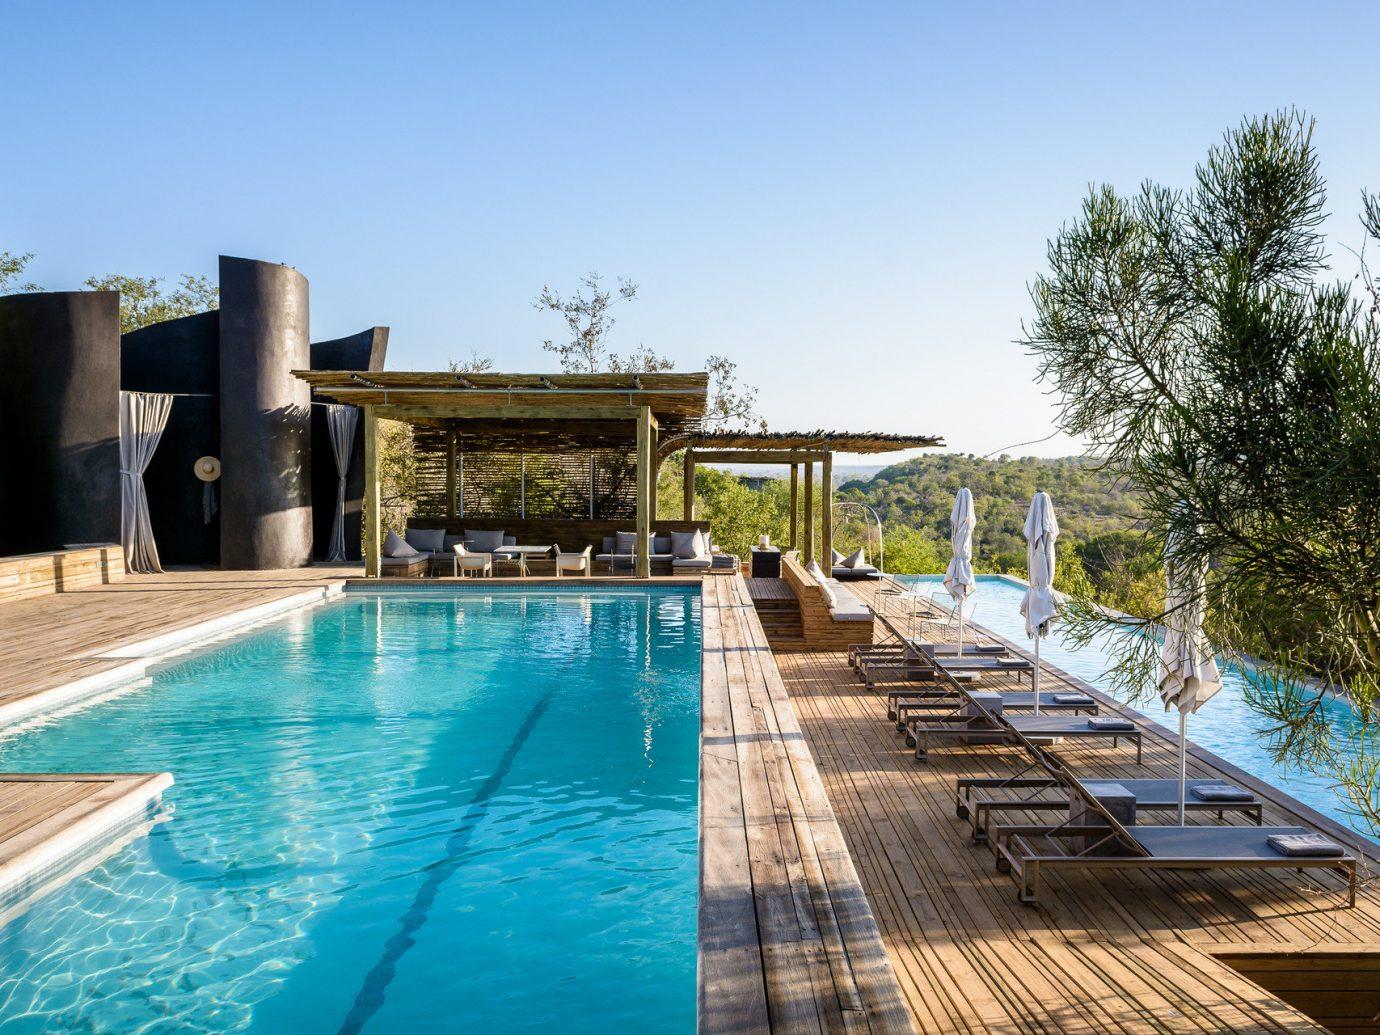 Hotels sky outdoor tree swimming pool leisure property estate Pool vacation Resort Villa real estate backyard condominium